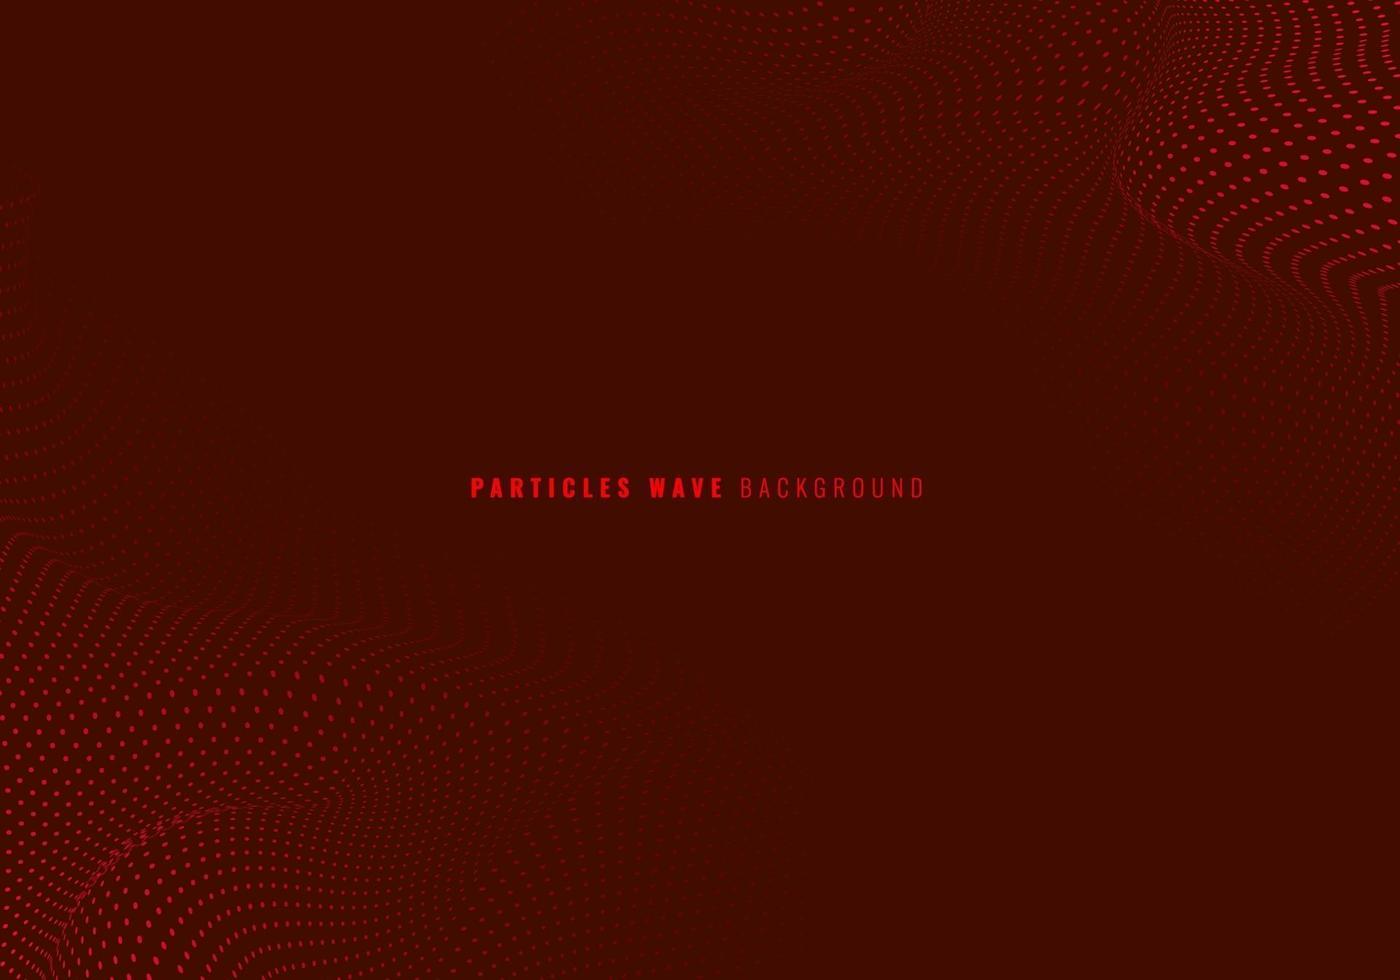 abstracte rode deeltjes stippen golf dynamische achtergrond. vector